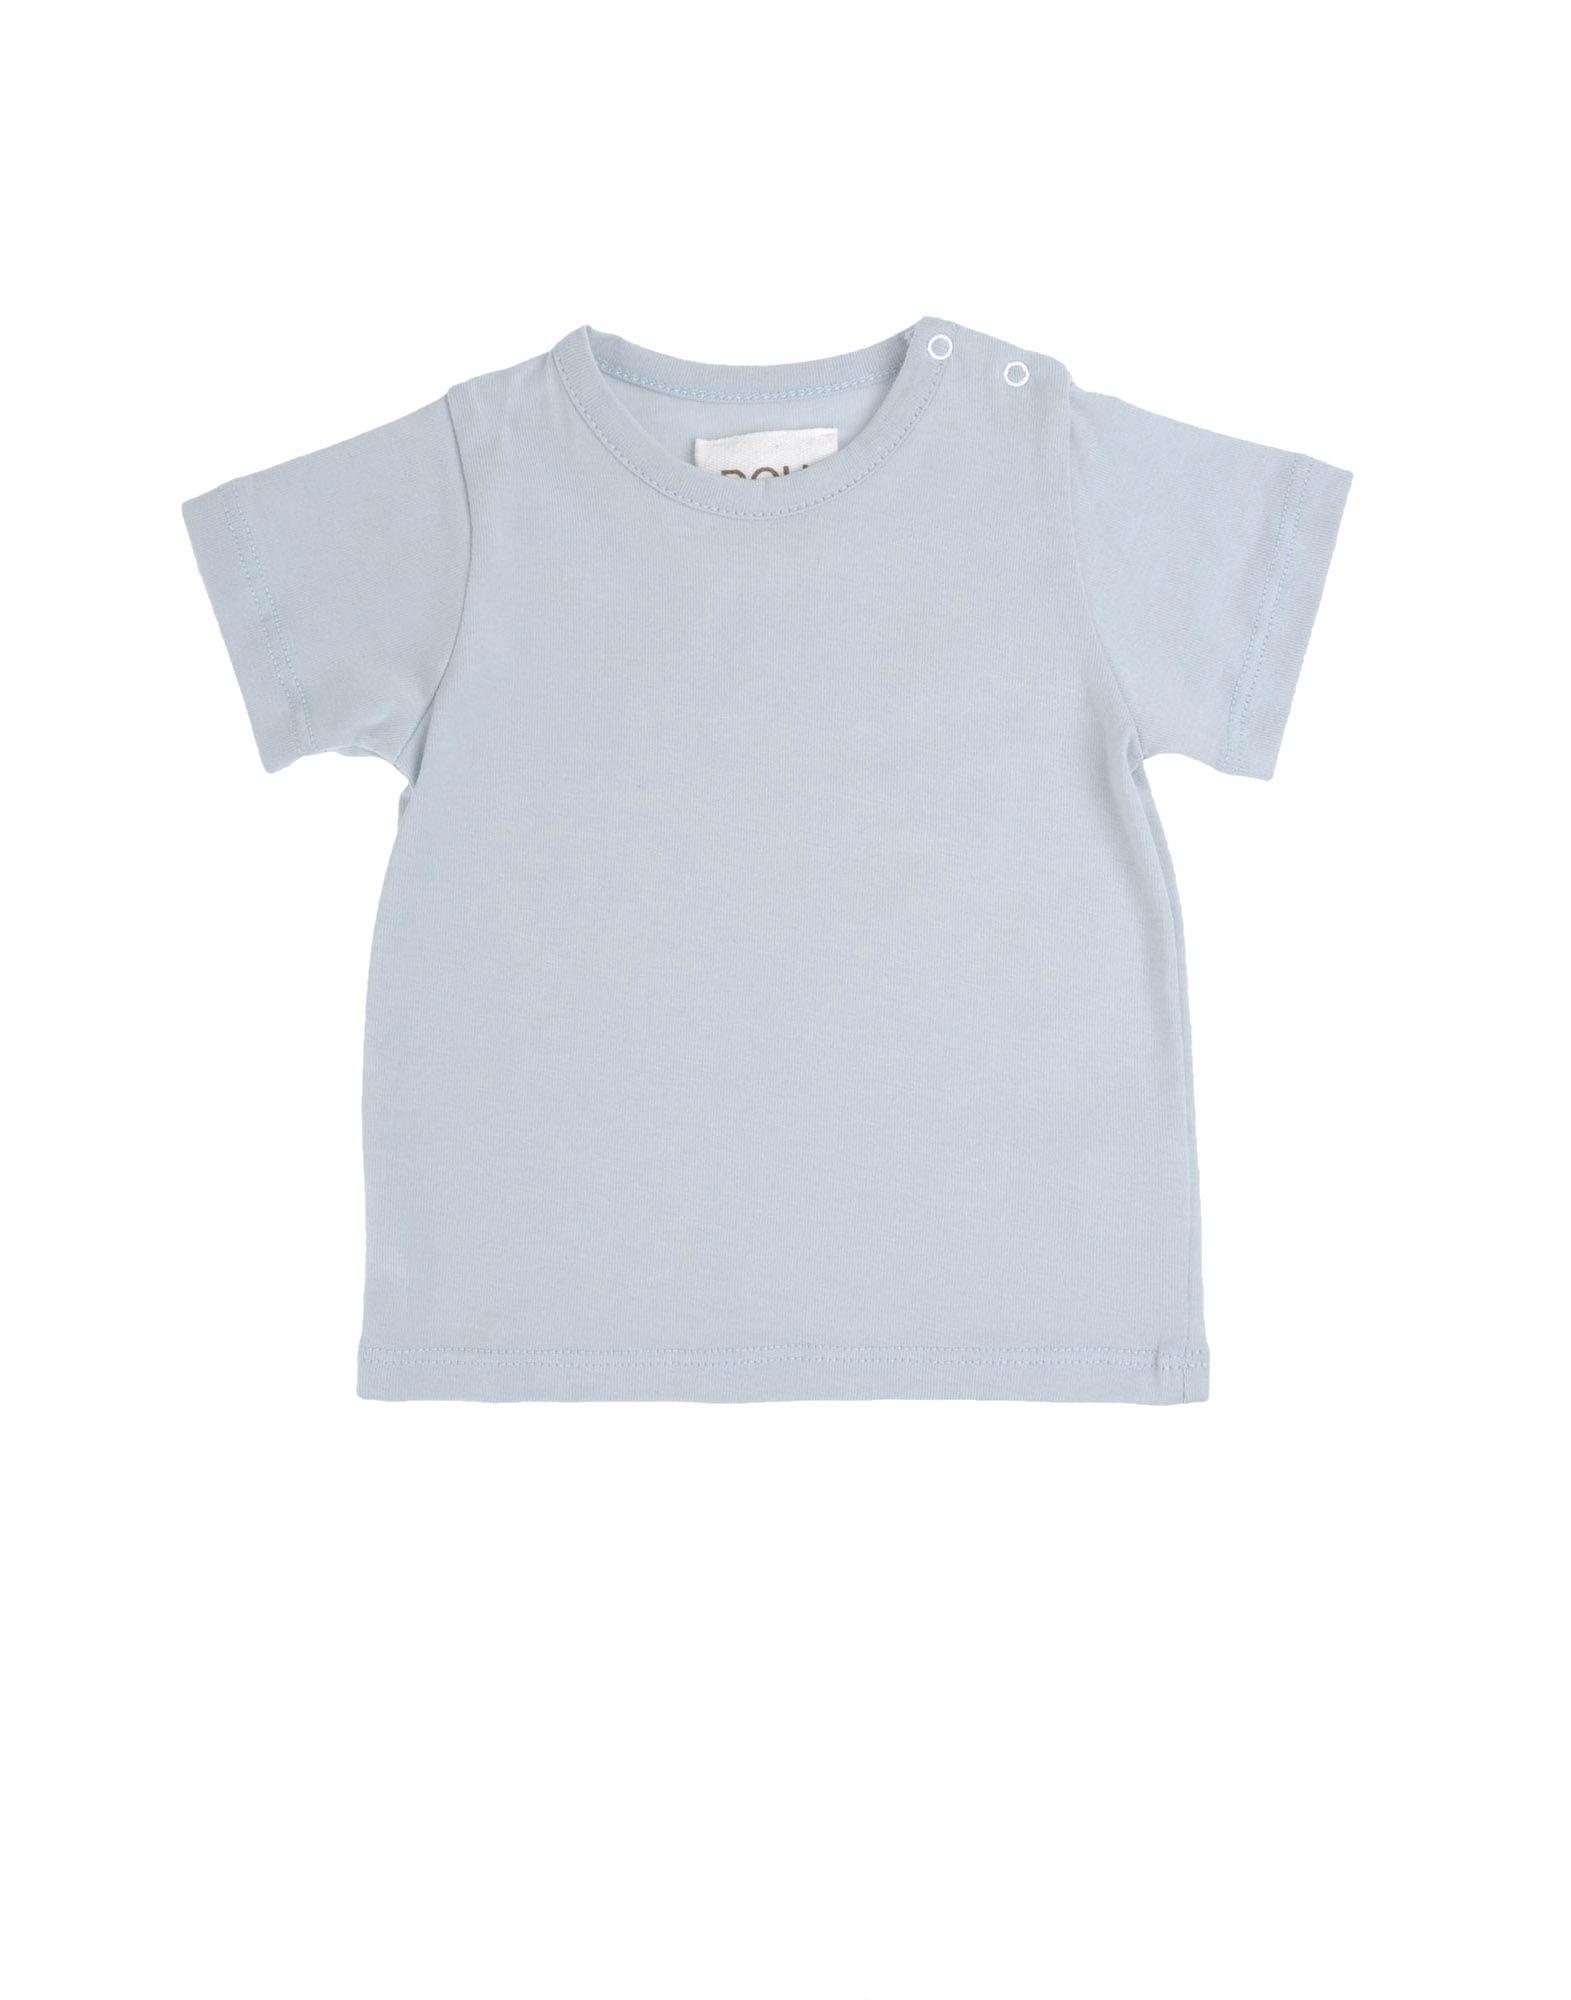 DOUUOD Mädchen 0-24 monate Kurzärmliges T-Shirt Farbe Hellgrau Größe 4